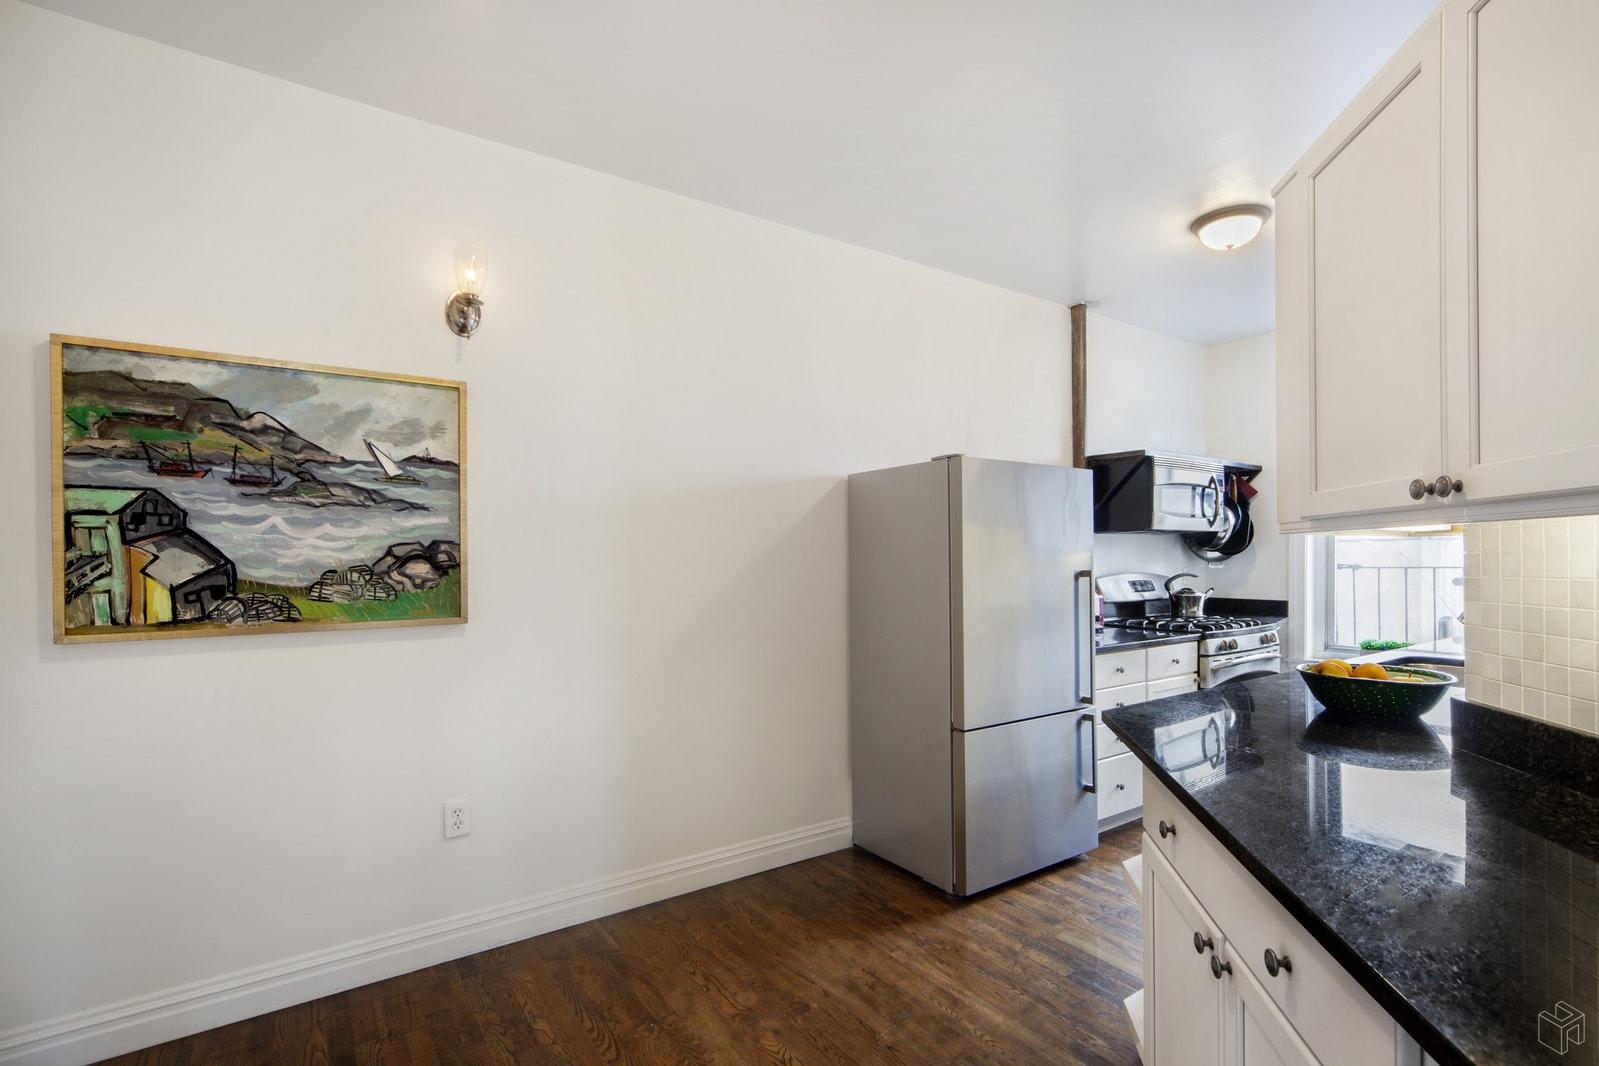 565 WEST 169TH STREET 5B, Washington Heights, $710,000, Web #: 18971690